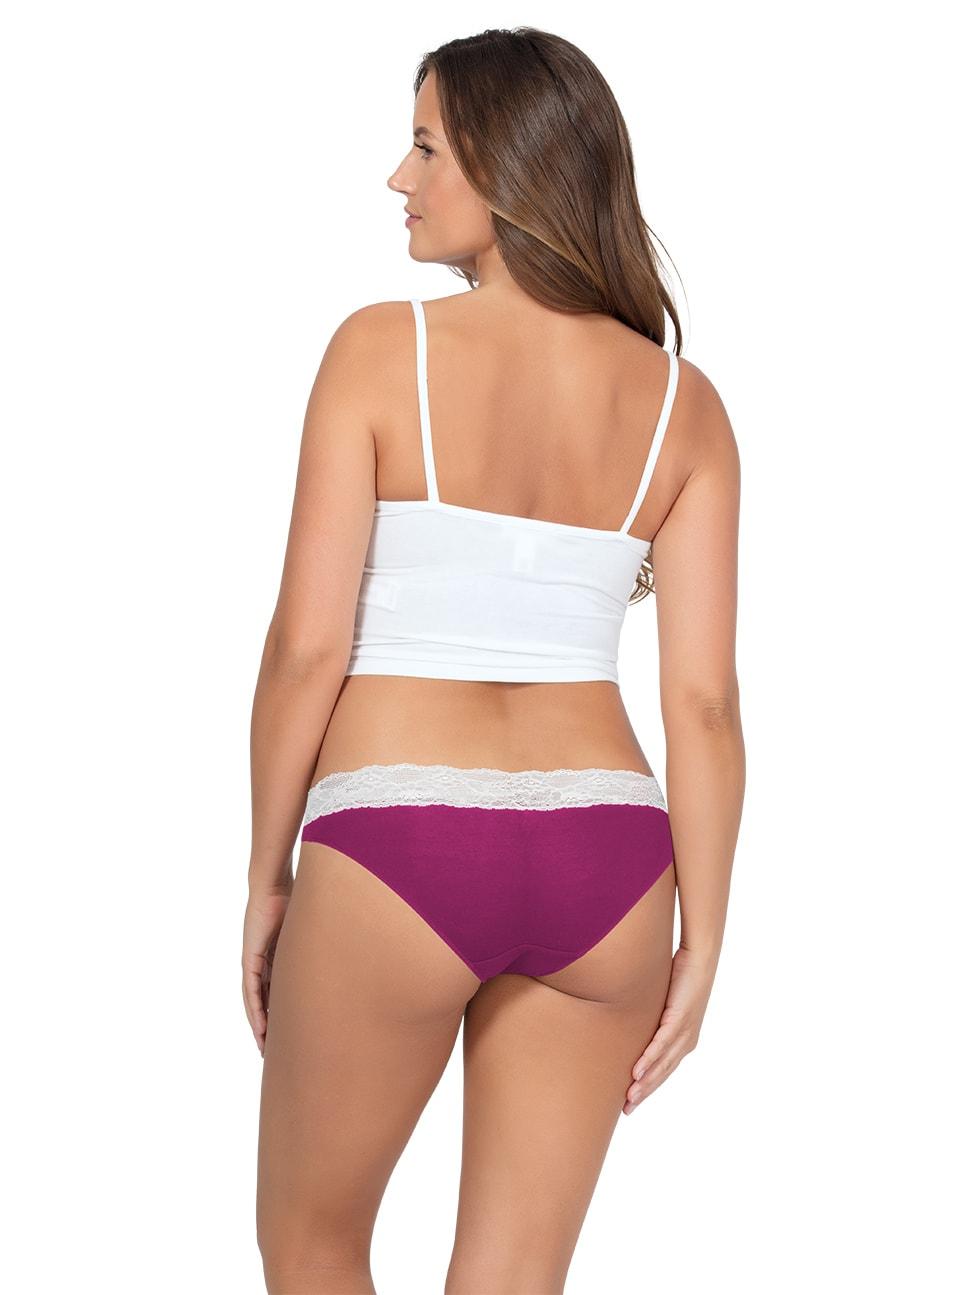 PARFAIT ParfaitPanty SoEssential BikiniPP303 WildPinkIvory Back copy - Parfait Panty So Essential Bikini- Wild Pink - PP303